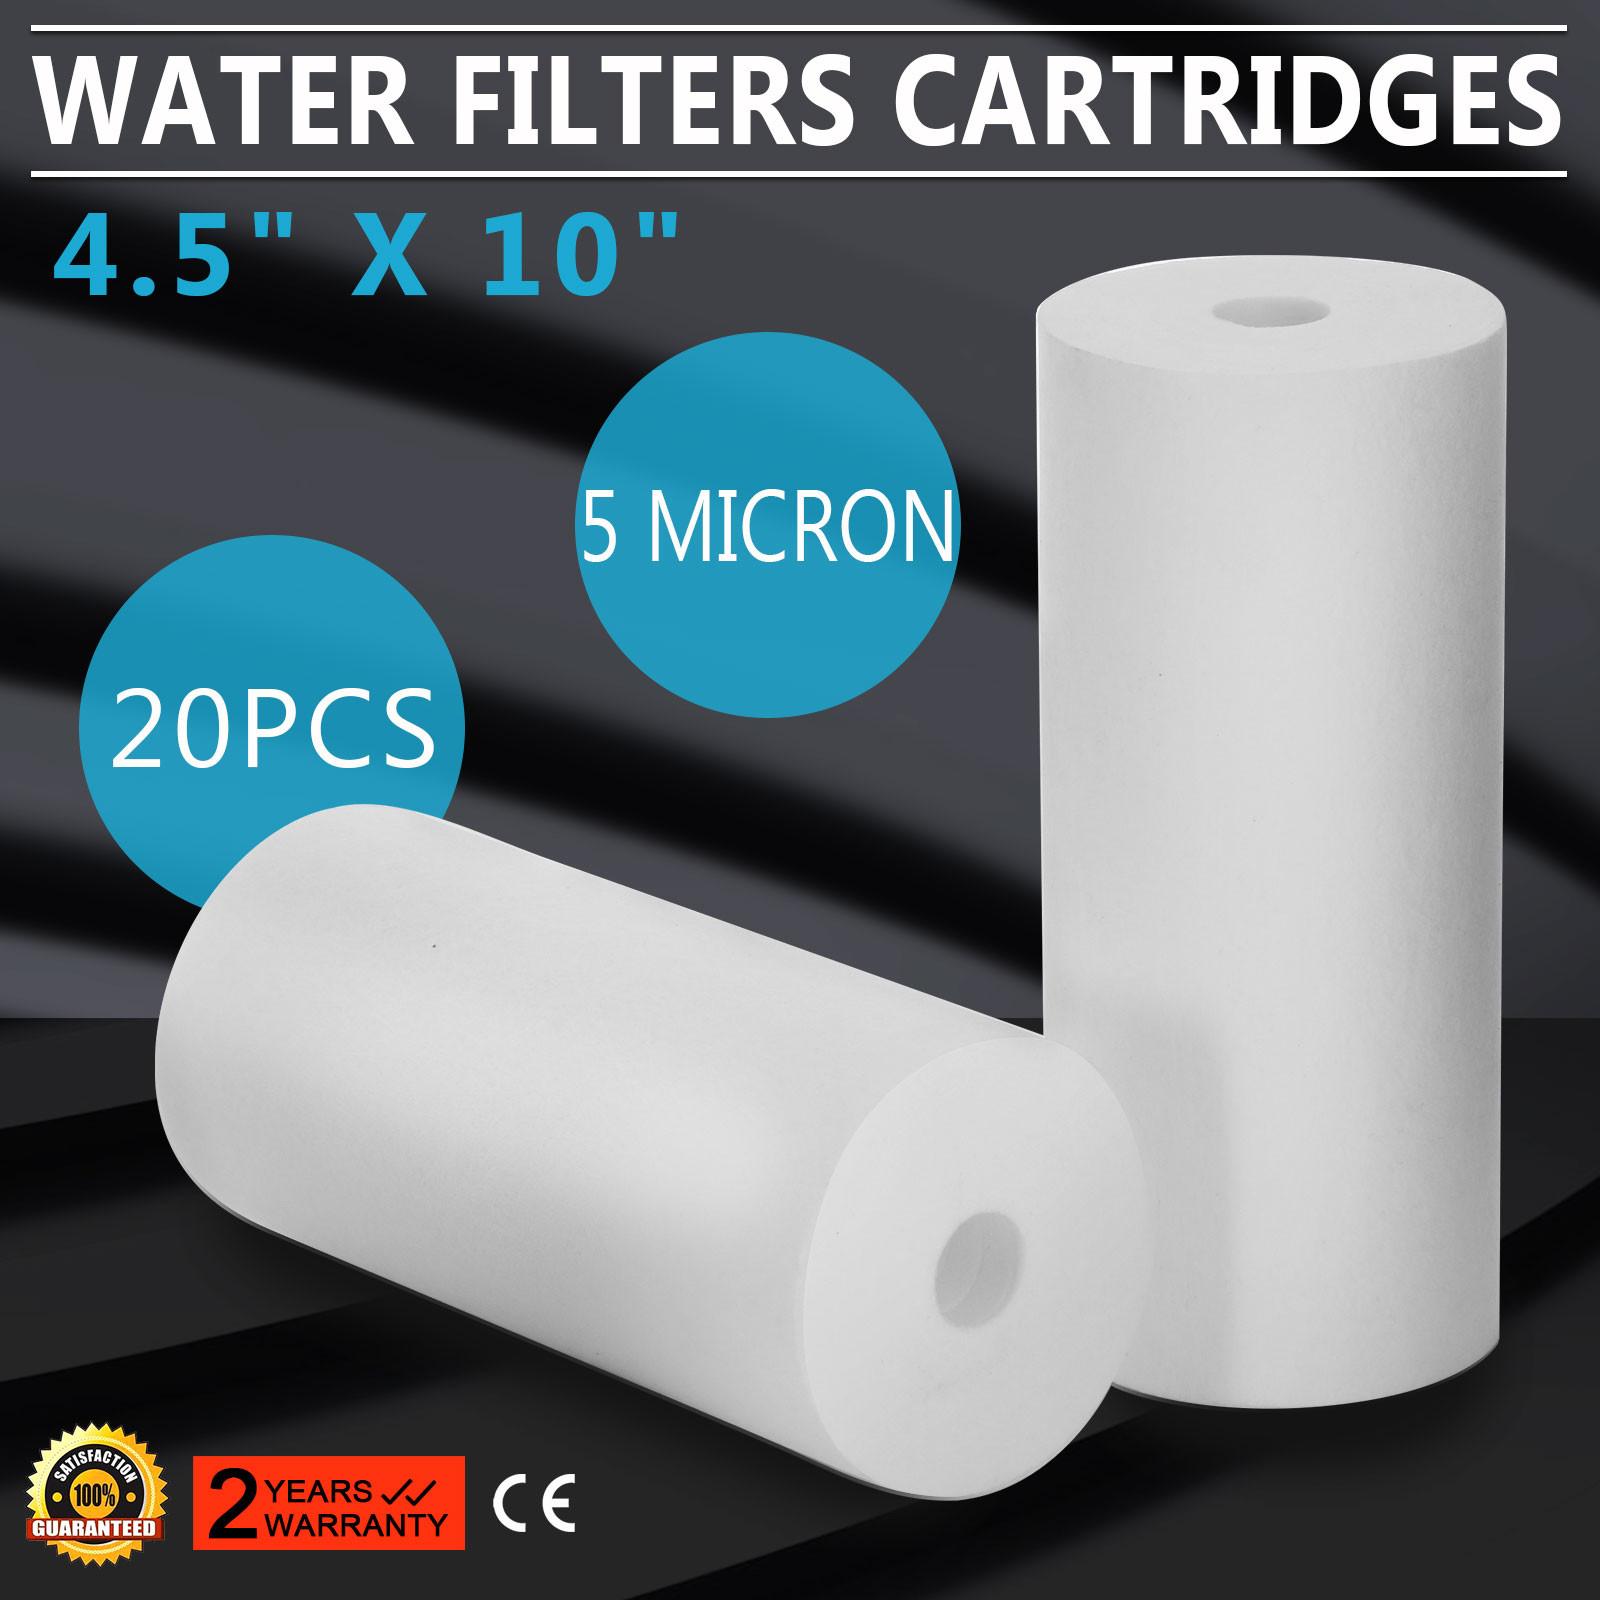 20Pcs-Cartouche-Filtrante-5-Micron-10-034-X-4-5-034-as-Brita-Emballe-Individu-Bobine